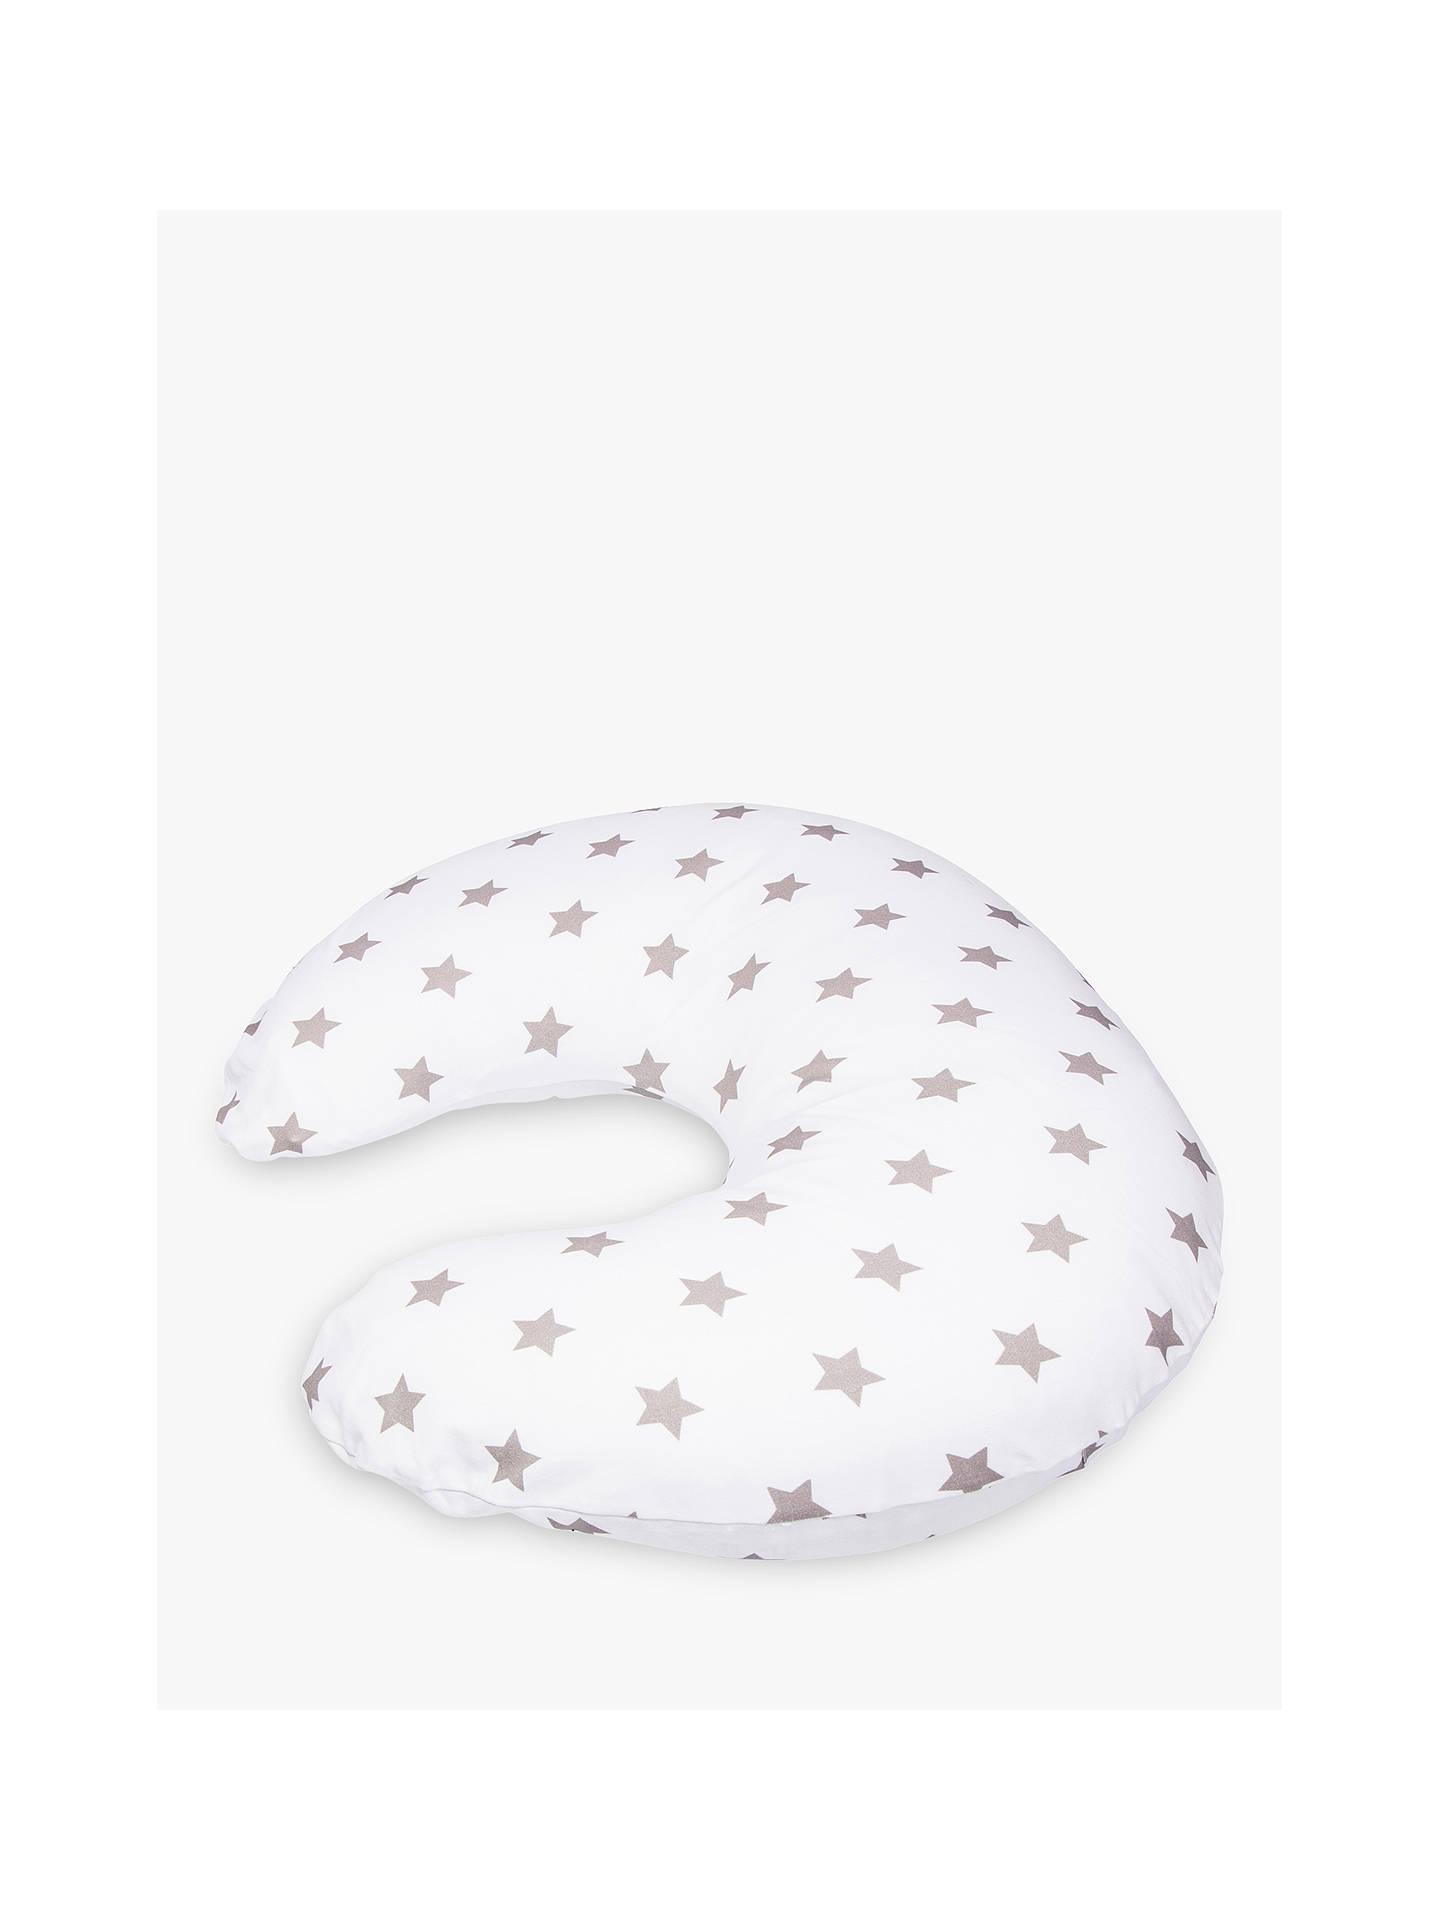 Black Feeding Pillow Nursing Cushion Nursery Maternity Pregnancy Baby Breast